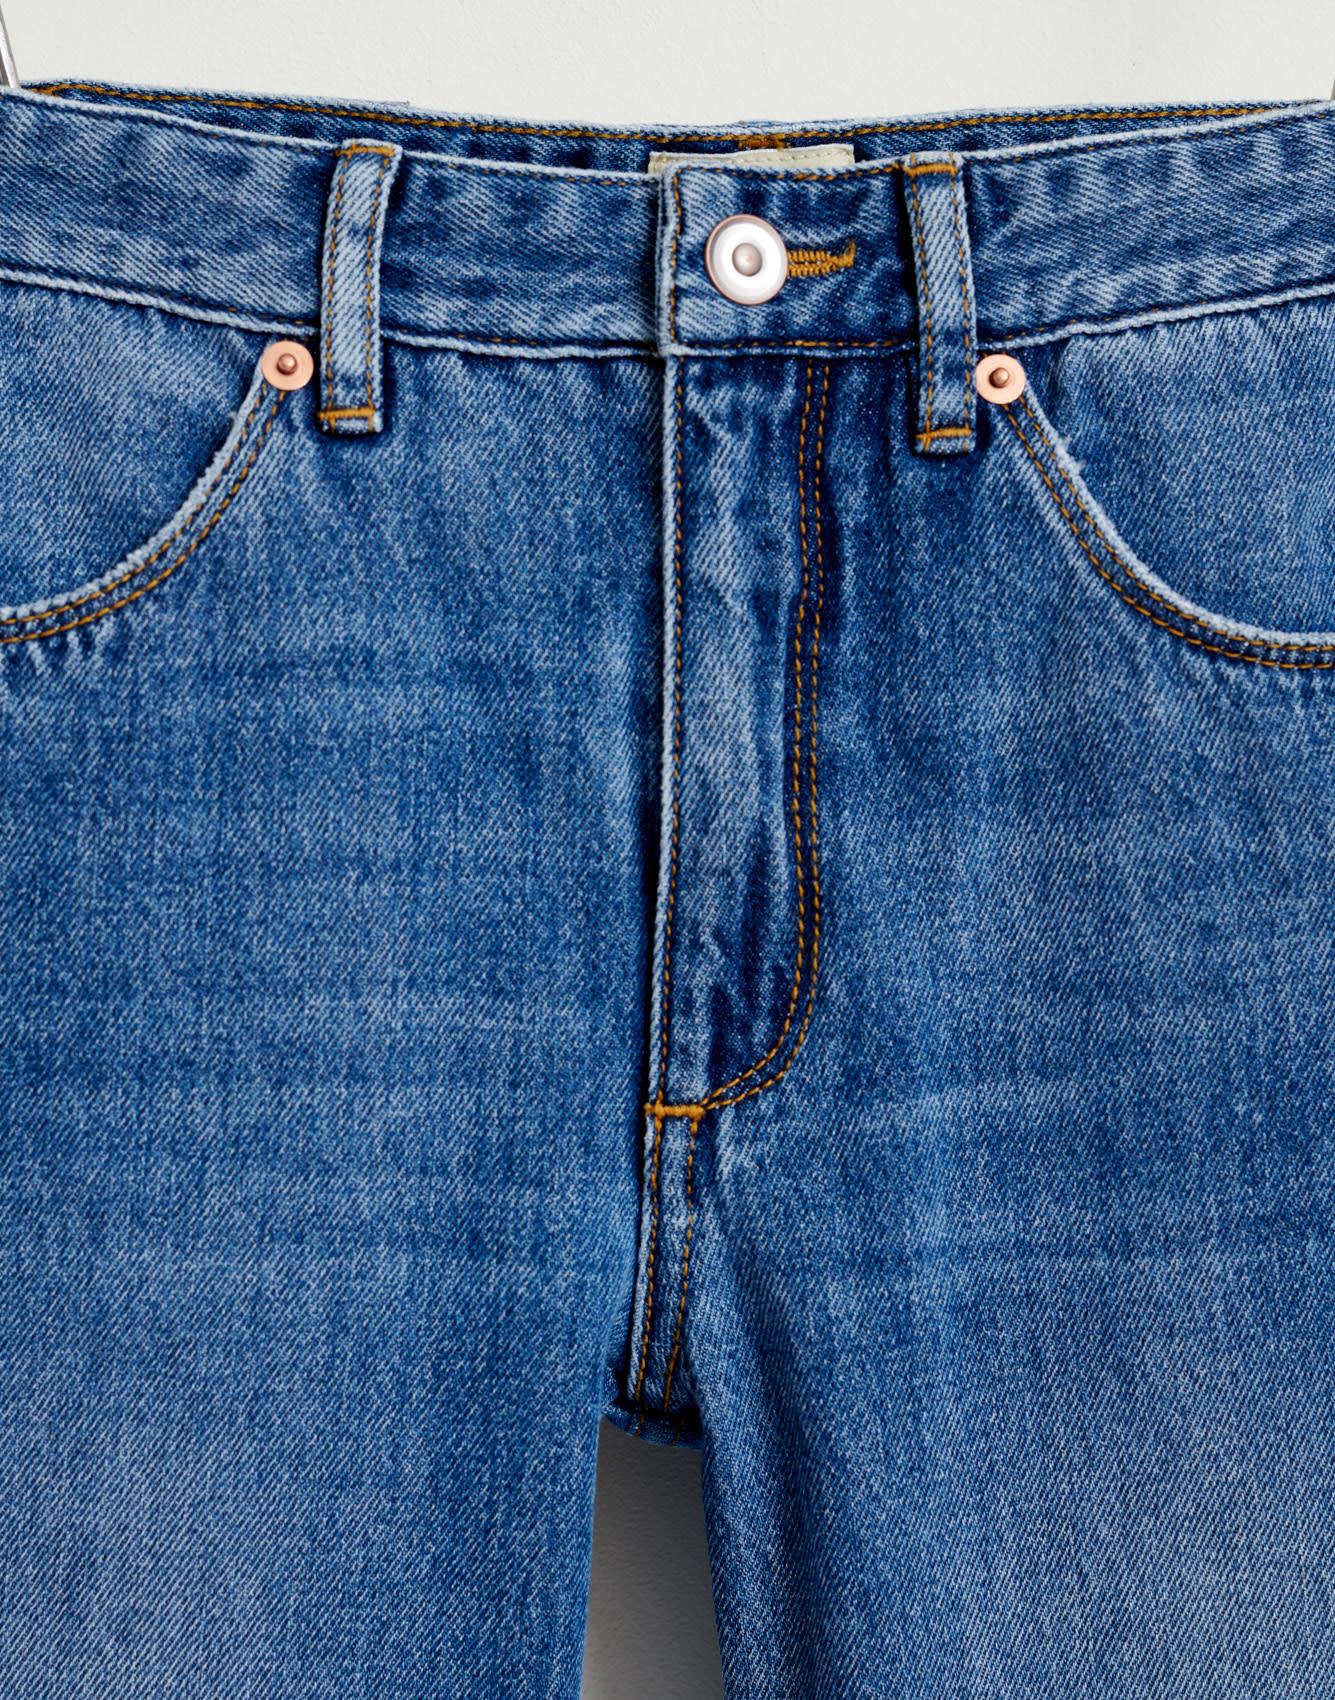 Pinata jeans grand daddy's-2